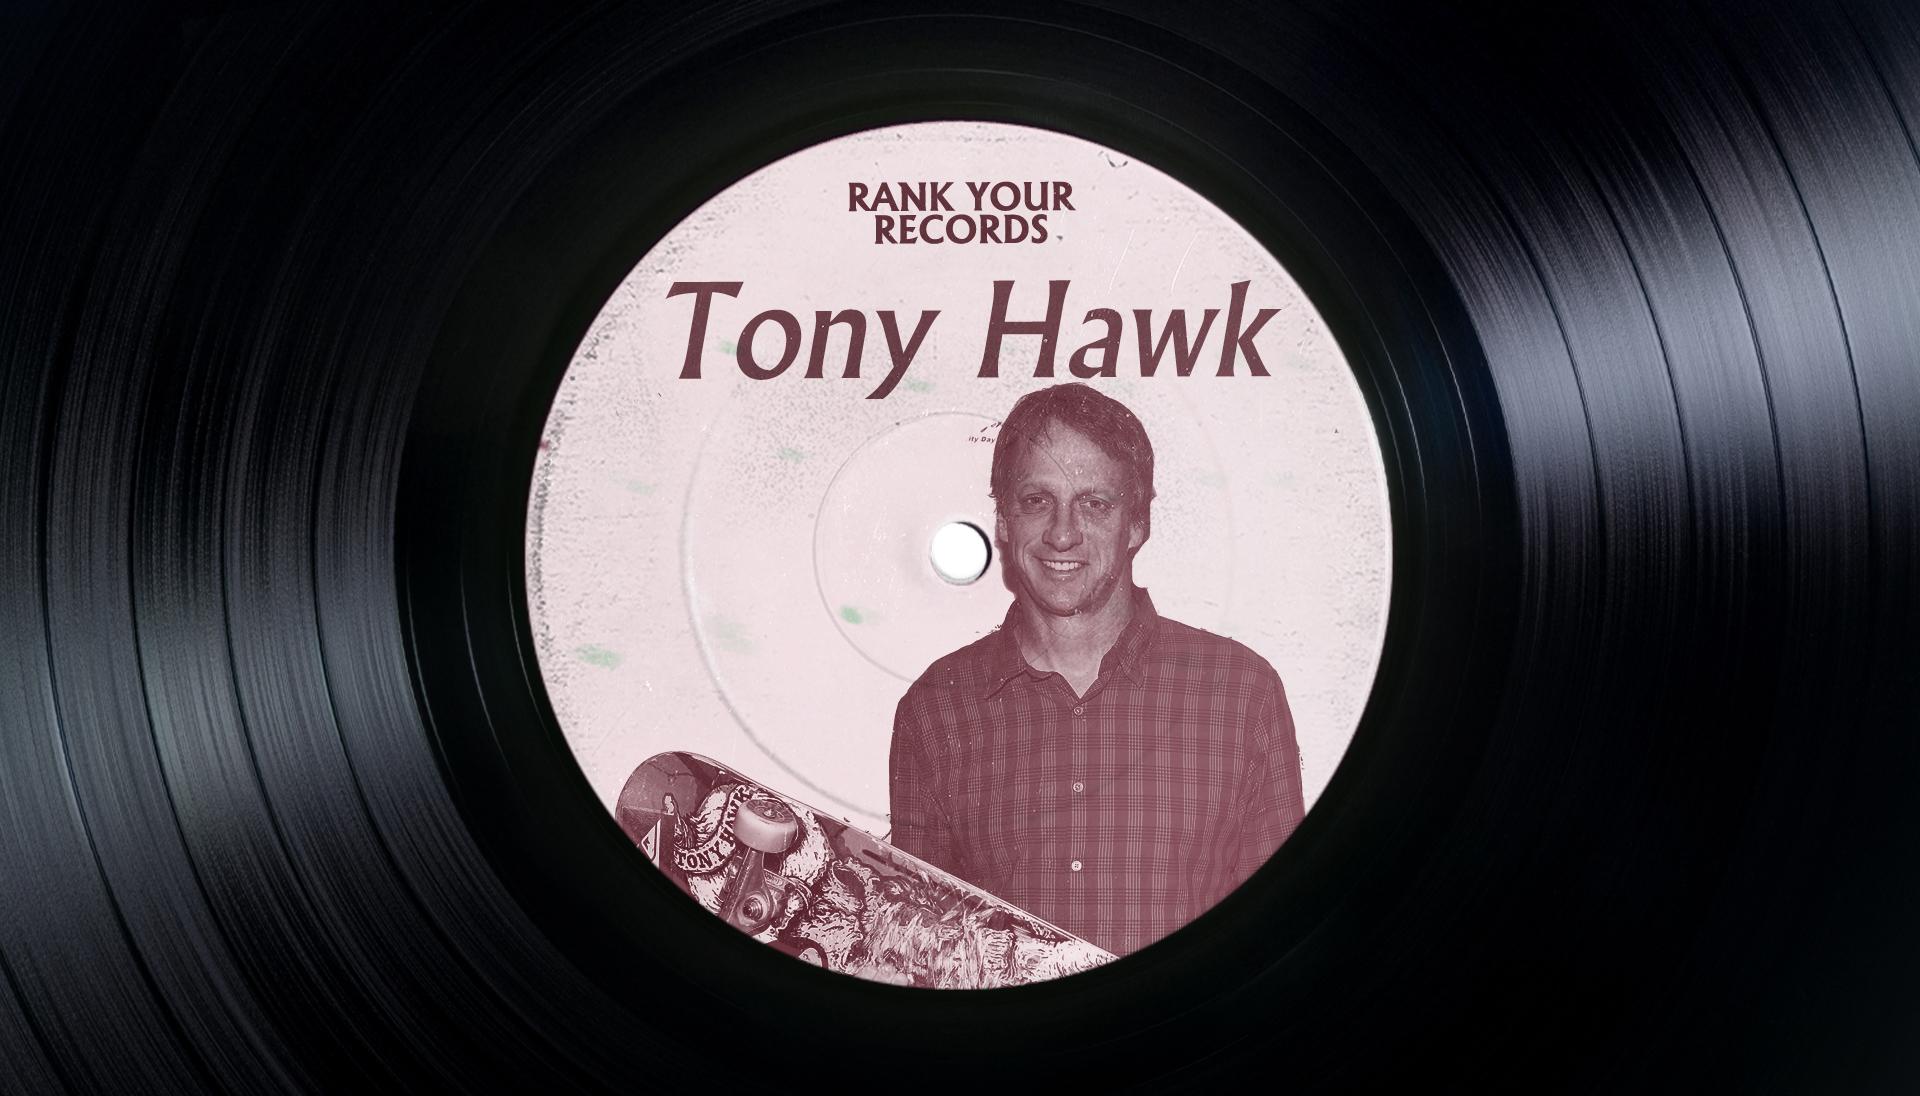 vice.com - Brendan Menapace - Tony Hawk Ranks His Video Game Soundtracks